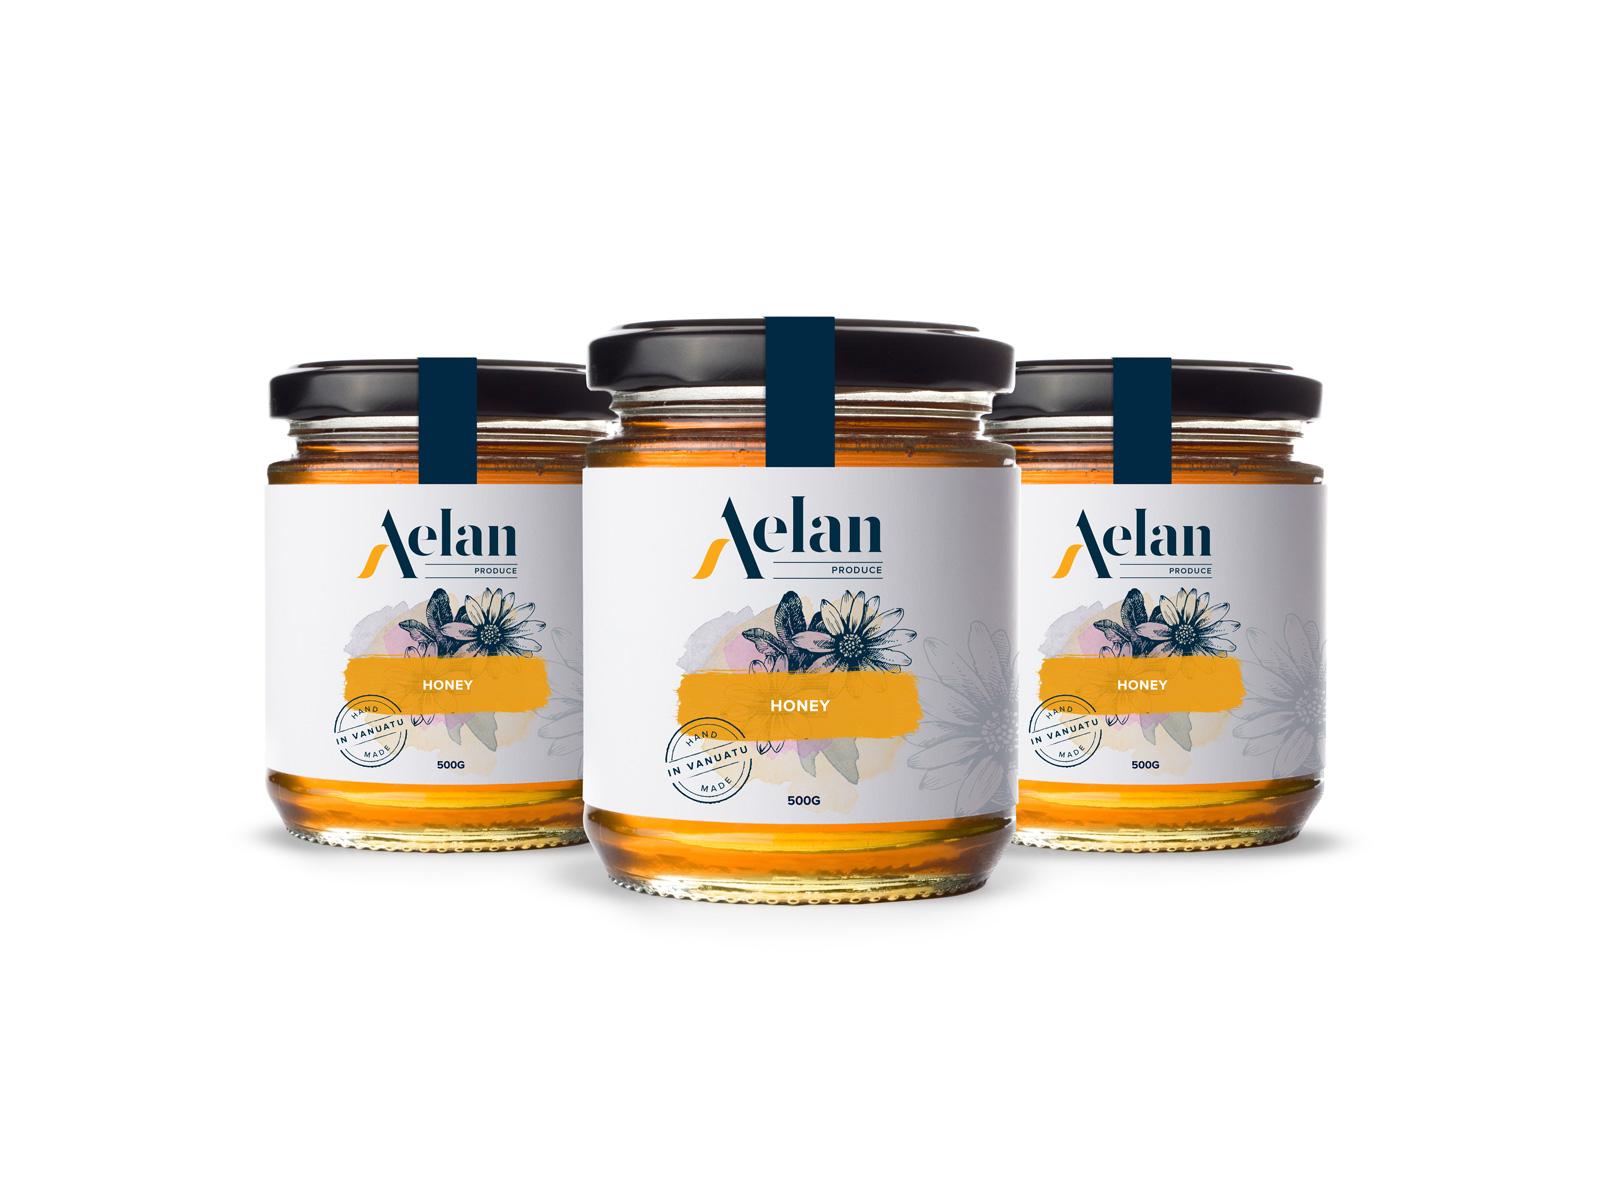 Aelan-honey-jars